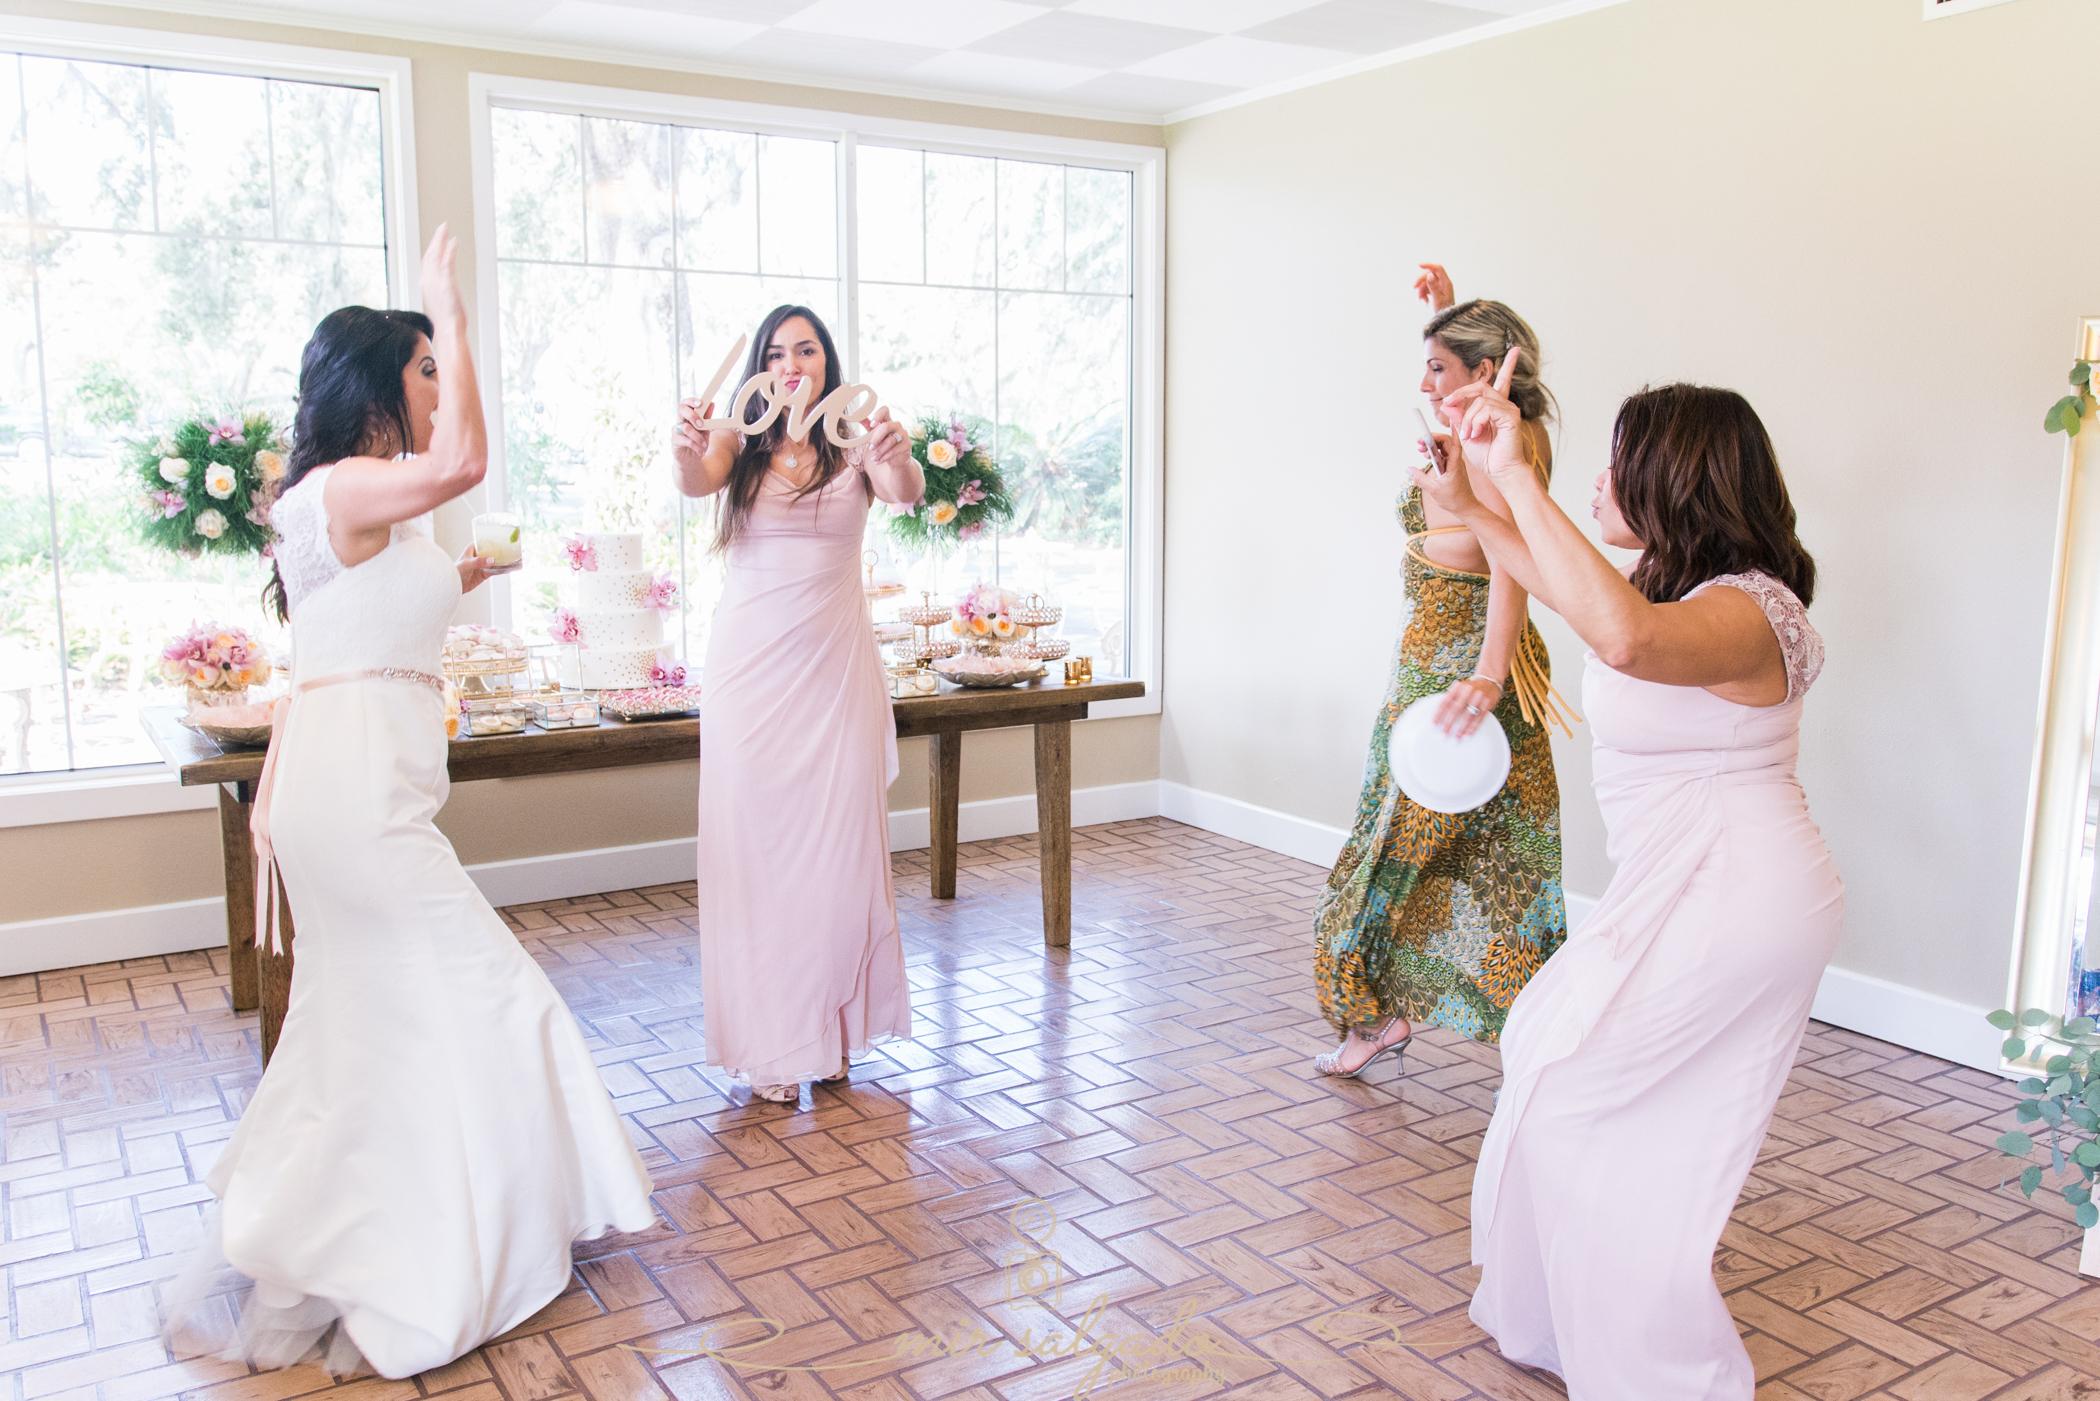 Bok-tower-gardens-wedding-party, reception-dance-photo, Tampa-weddings